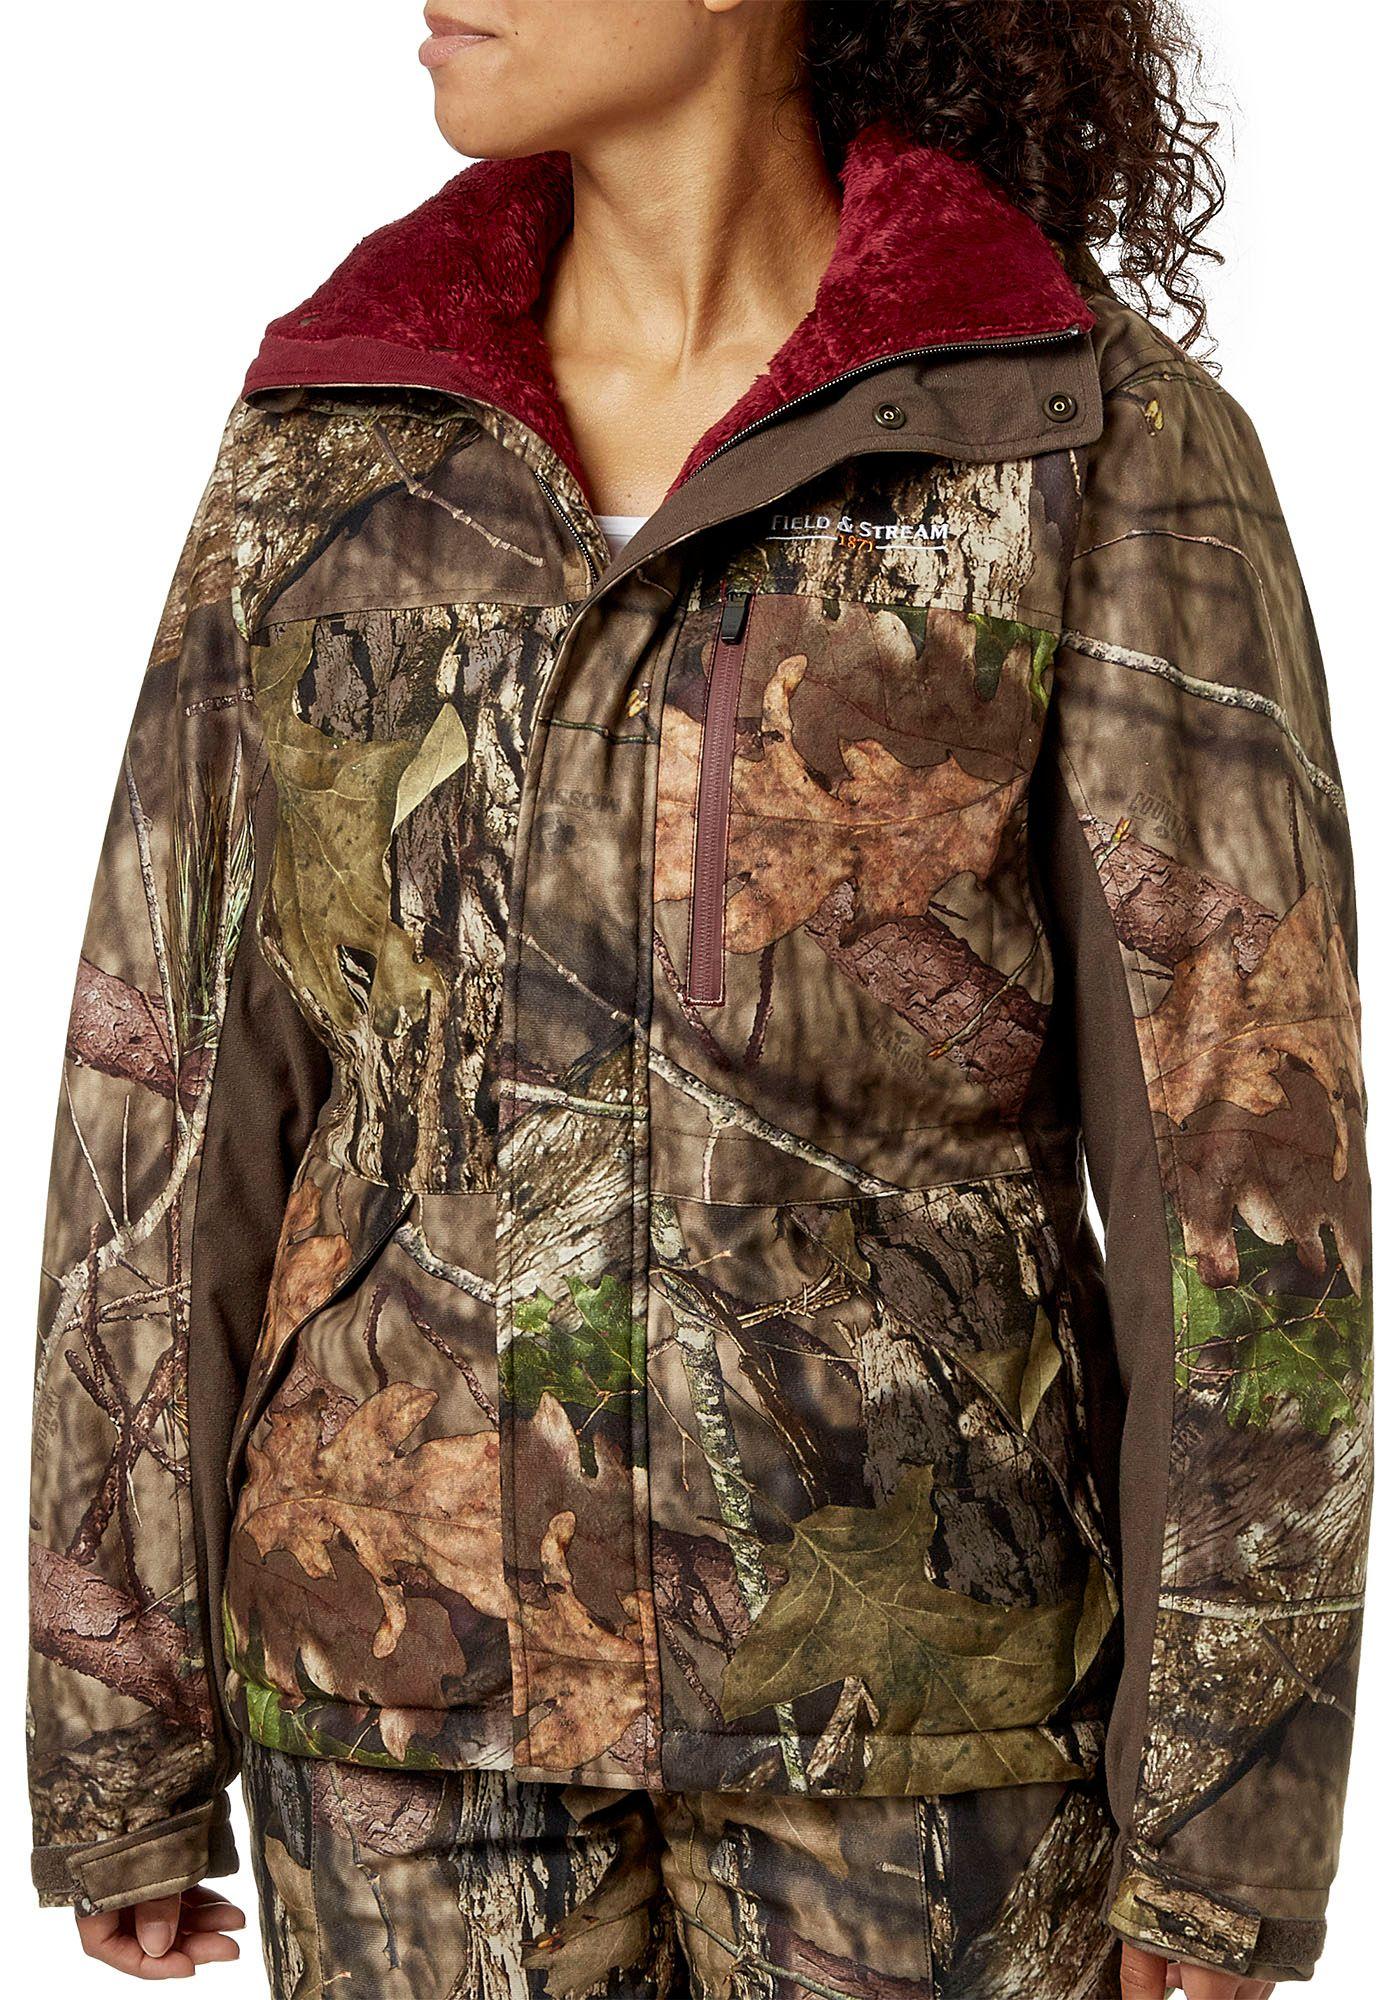 Field & Stream Women's Command Hunt SmartHeat Insulated Hunting Parka